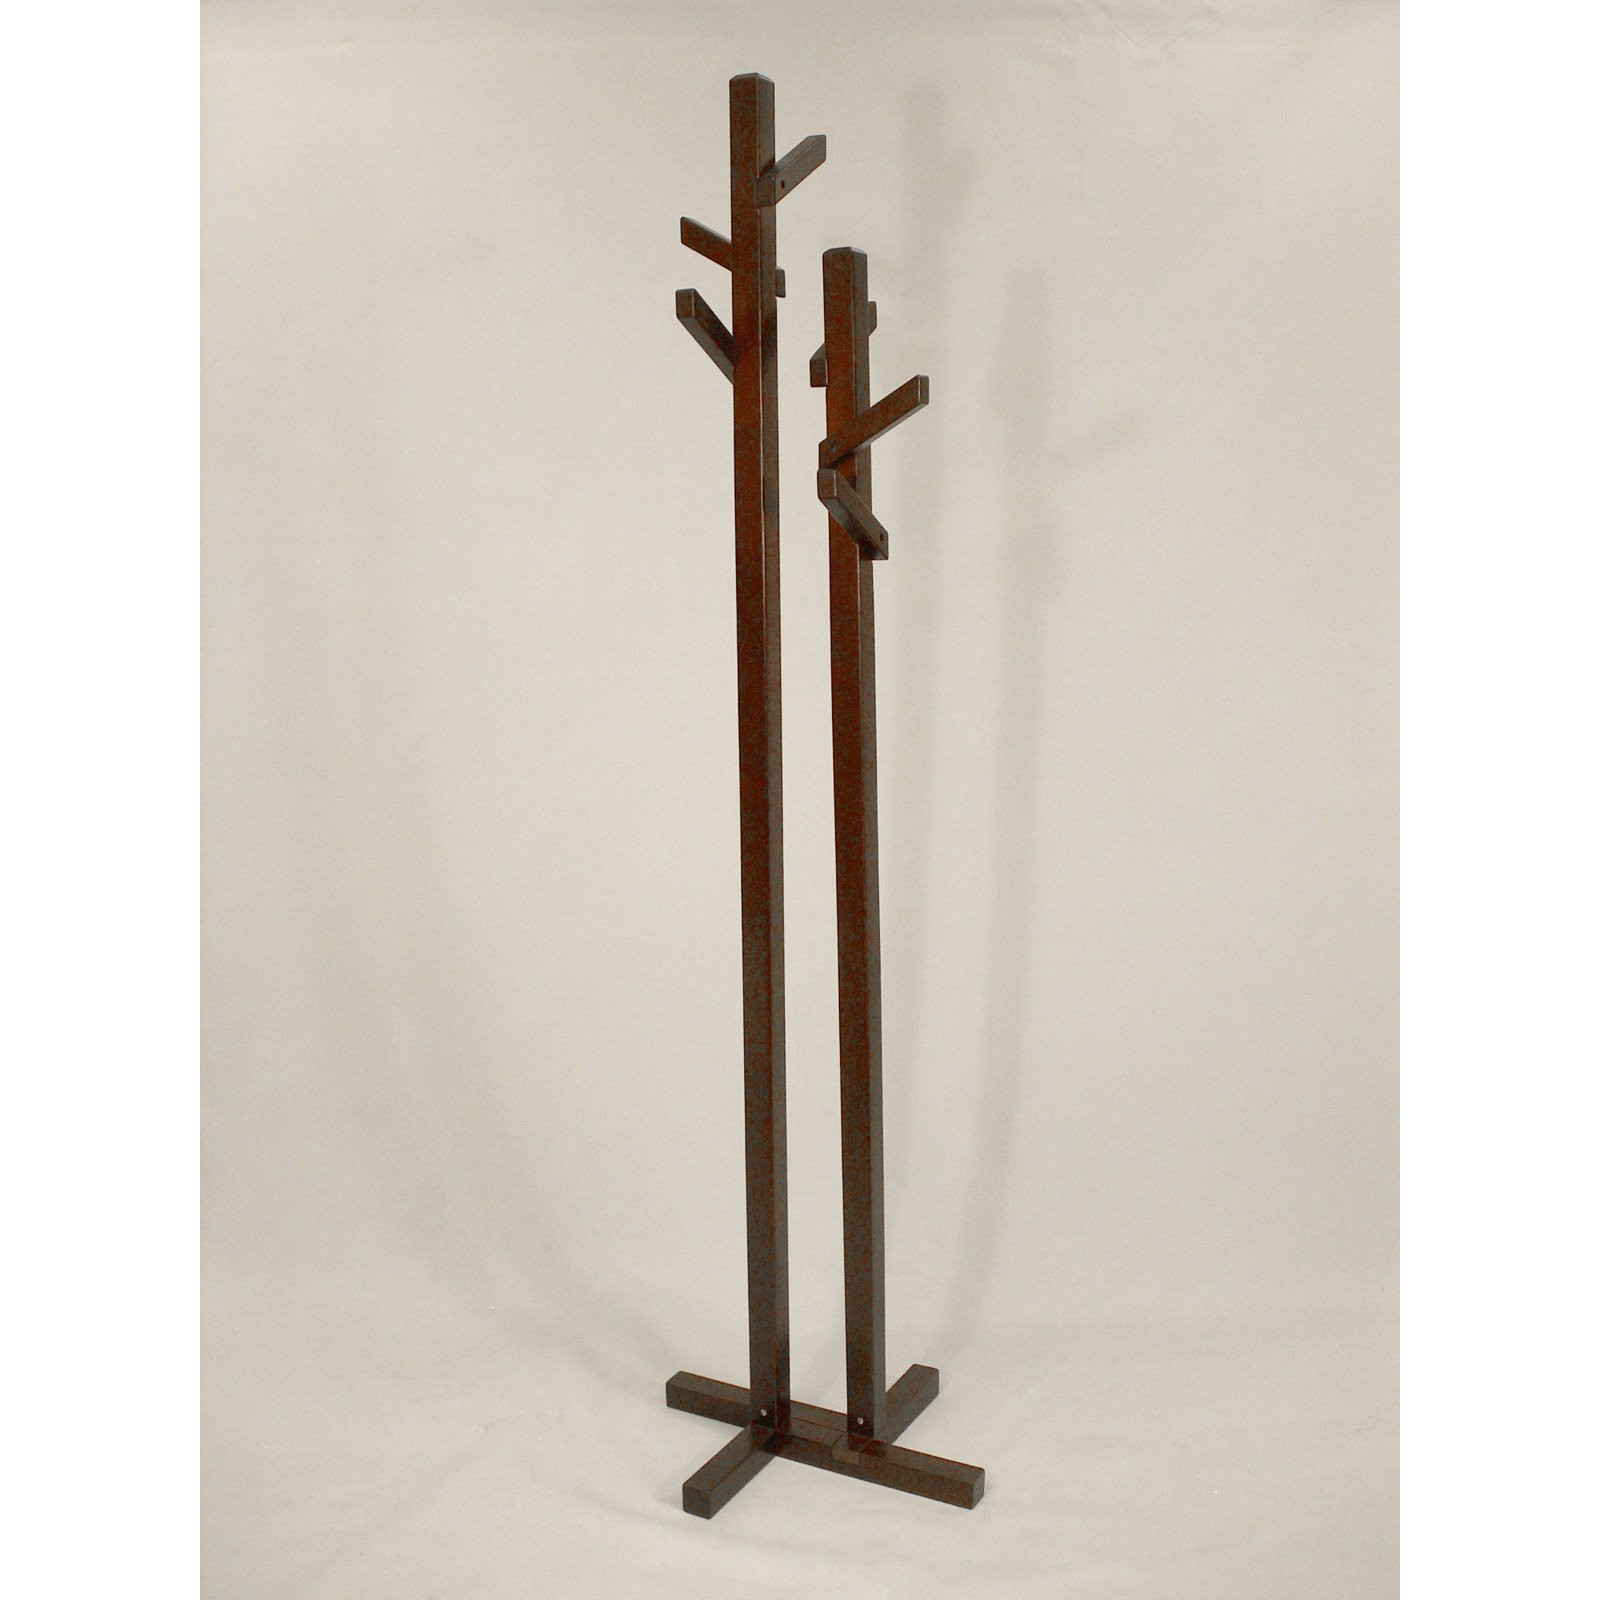 Double Tree Coat Rack - Dark Walnut